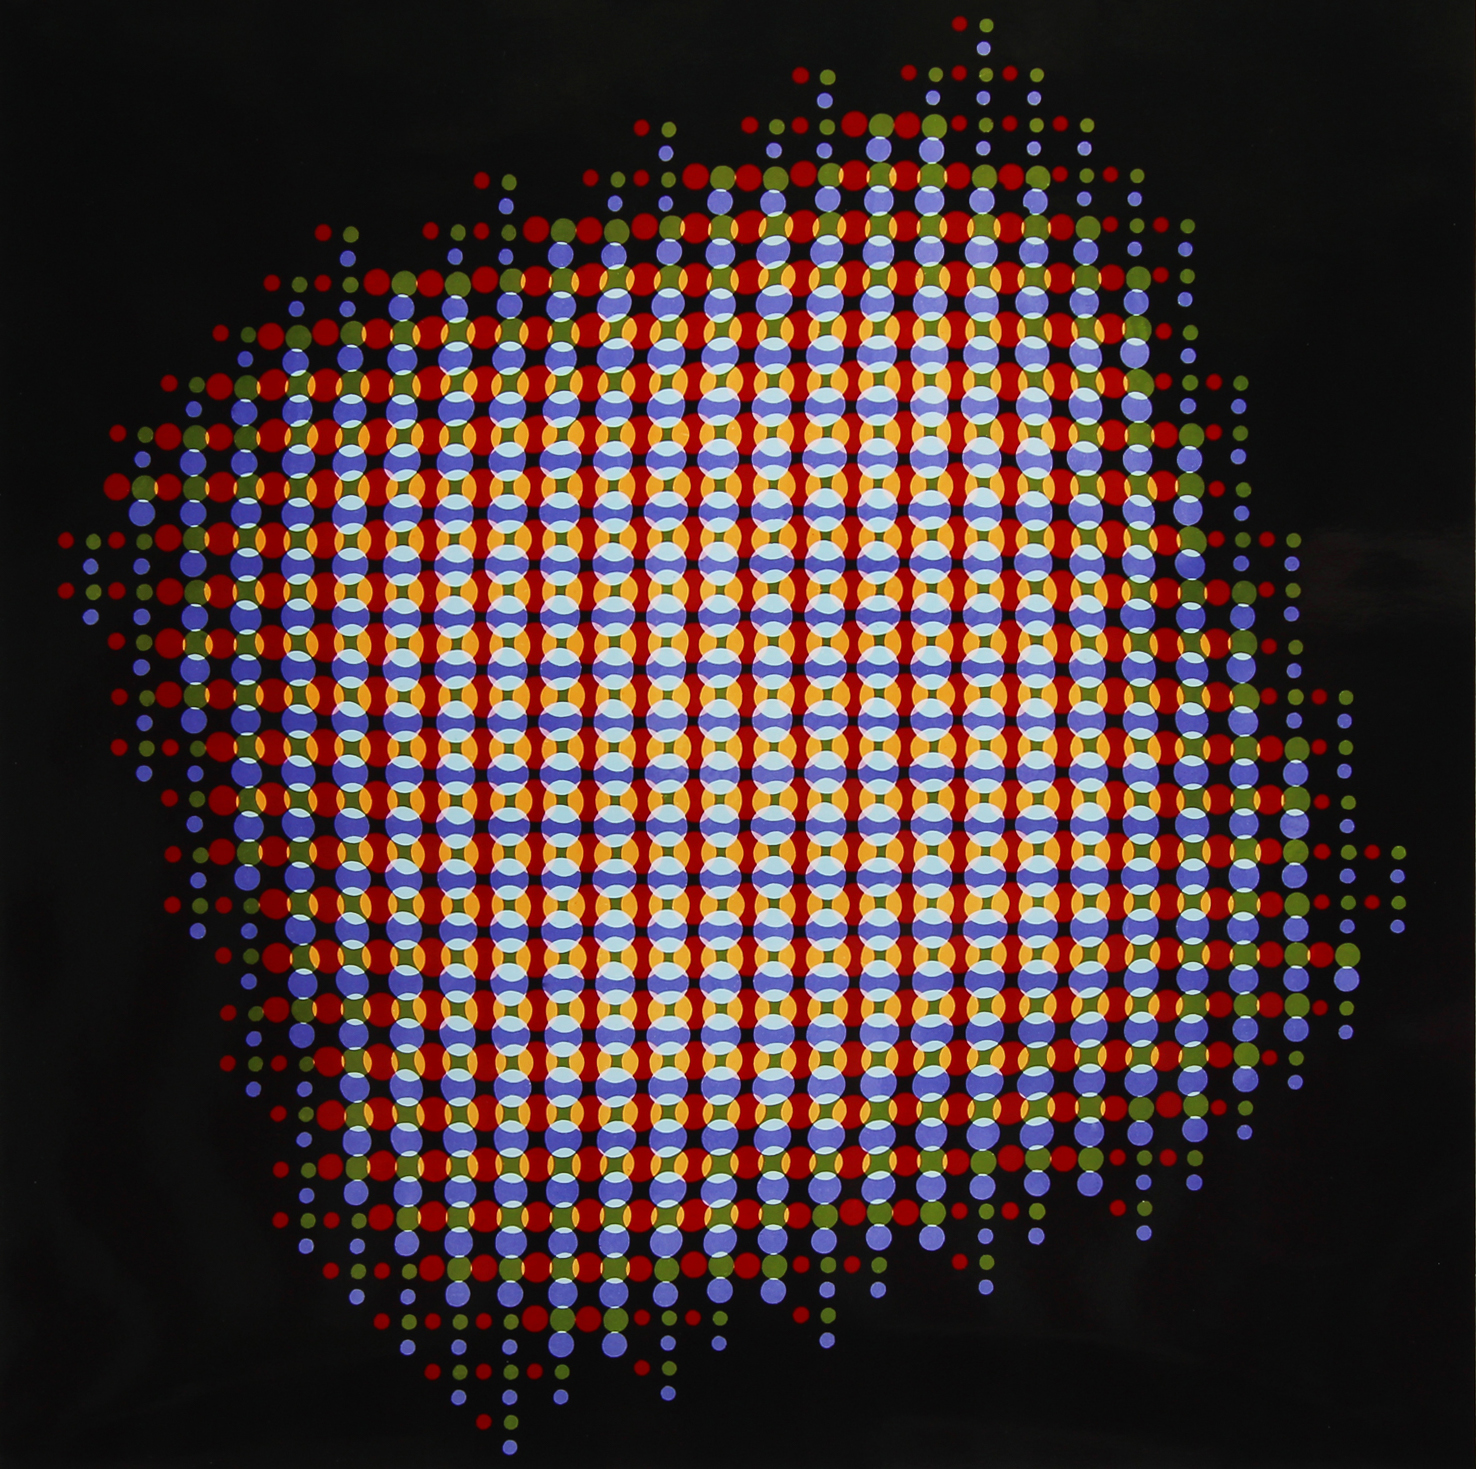 Image above: ©Gottfried Jäger,Lochblendenstruktur (Pinhole Structure) (Camera obscura work, 3.8.14 C 2.5) , 1967/2015 /Courtesy Steven Kasher Gallery, New York